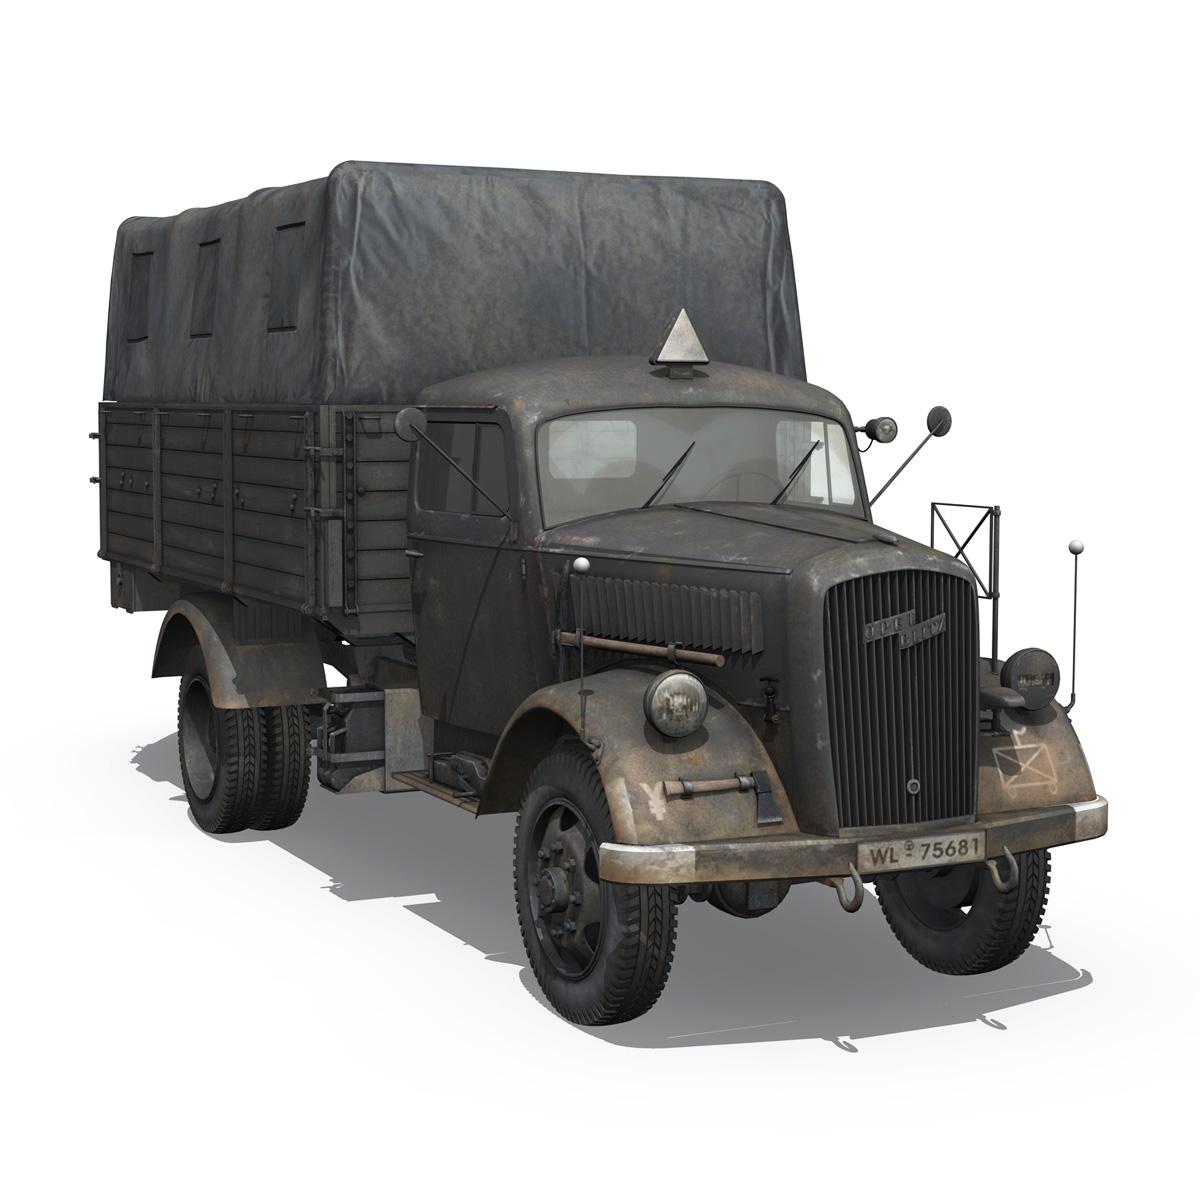 blitz opel - lori cargo 3t - 17 pzdiv model 3d 3ds fbx c4d lwo obj 197202